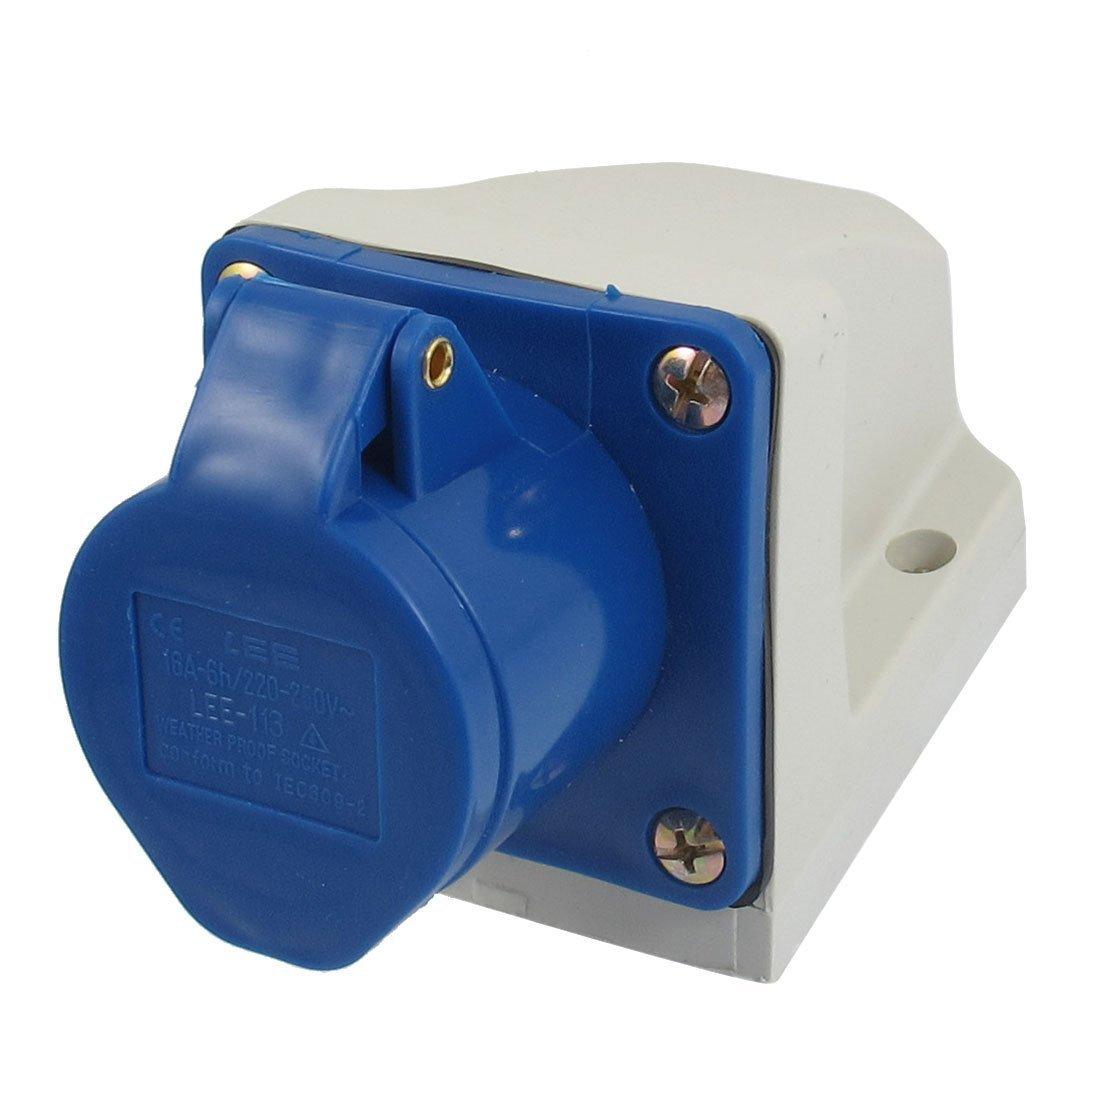 AC 220V-250V 16A 2P+E IEC309-2 Panel Mount Industrial Socket TRTASJNIEJ534